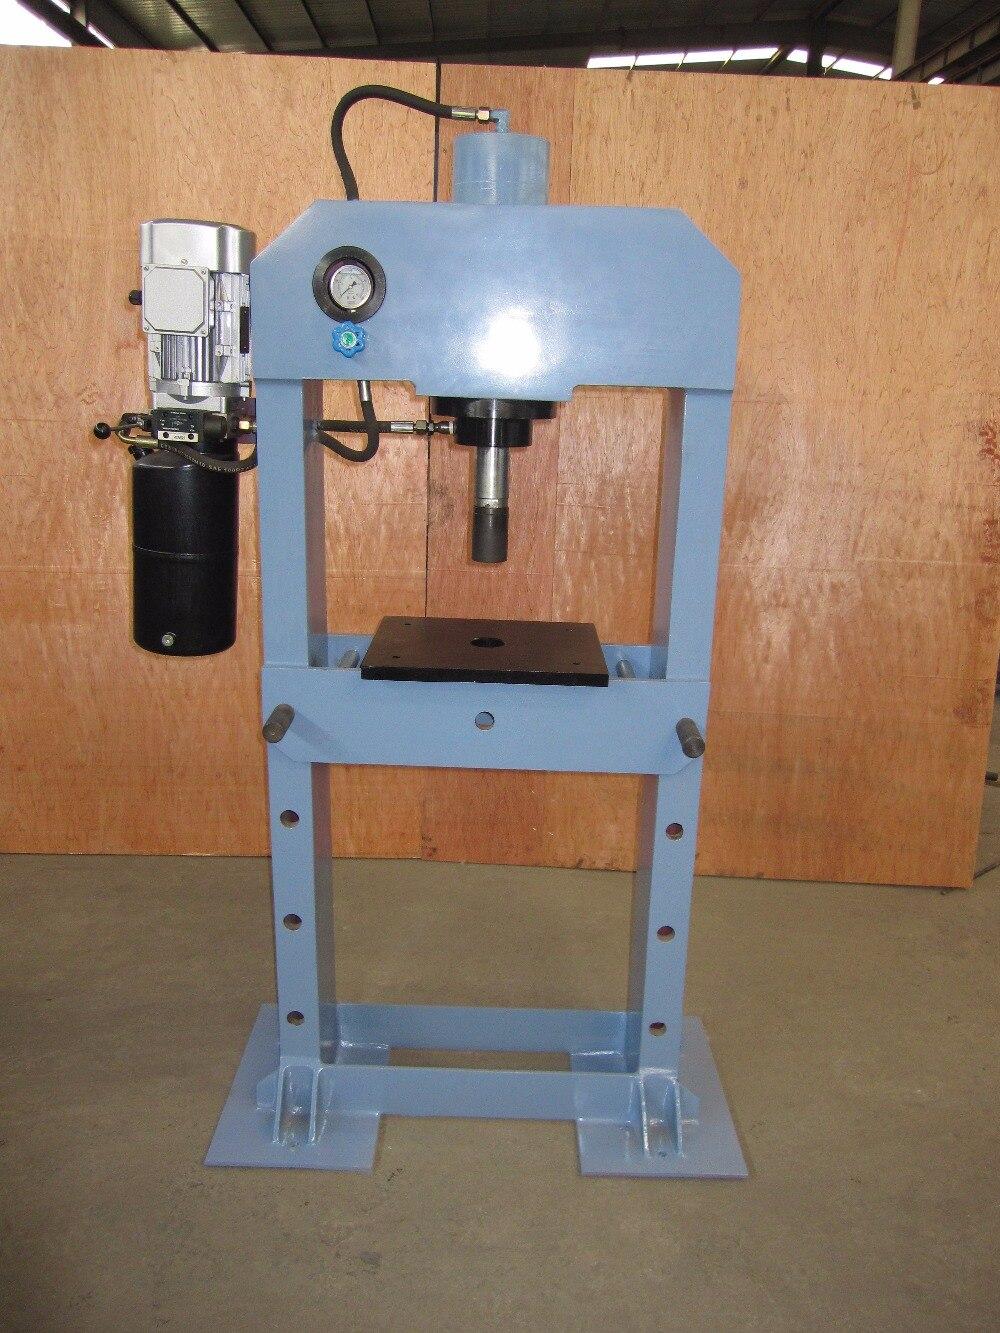 YJL 30 electric hydraulic press machine shop machinery tools